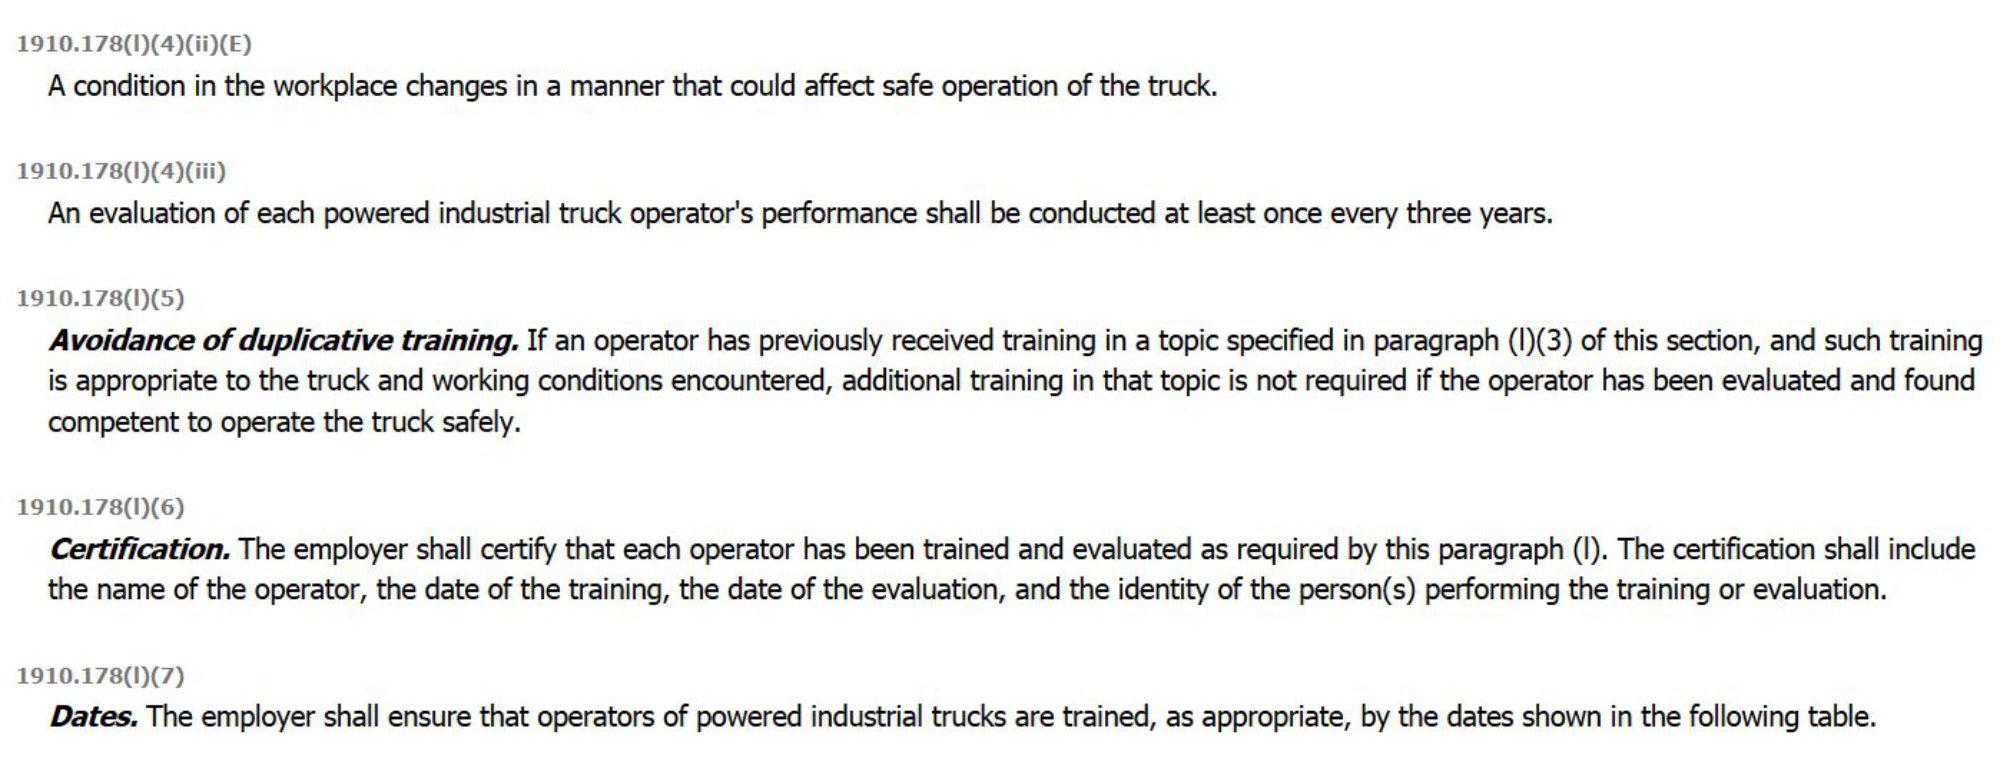 Osha Forklift Operator Traininig Compliance Nashville Tn